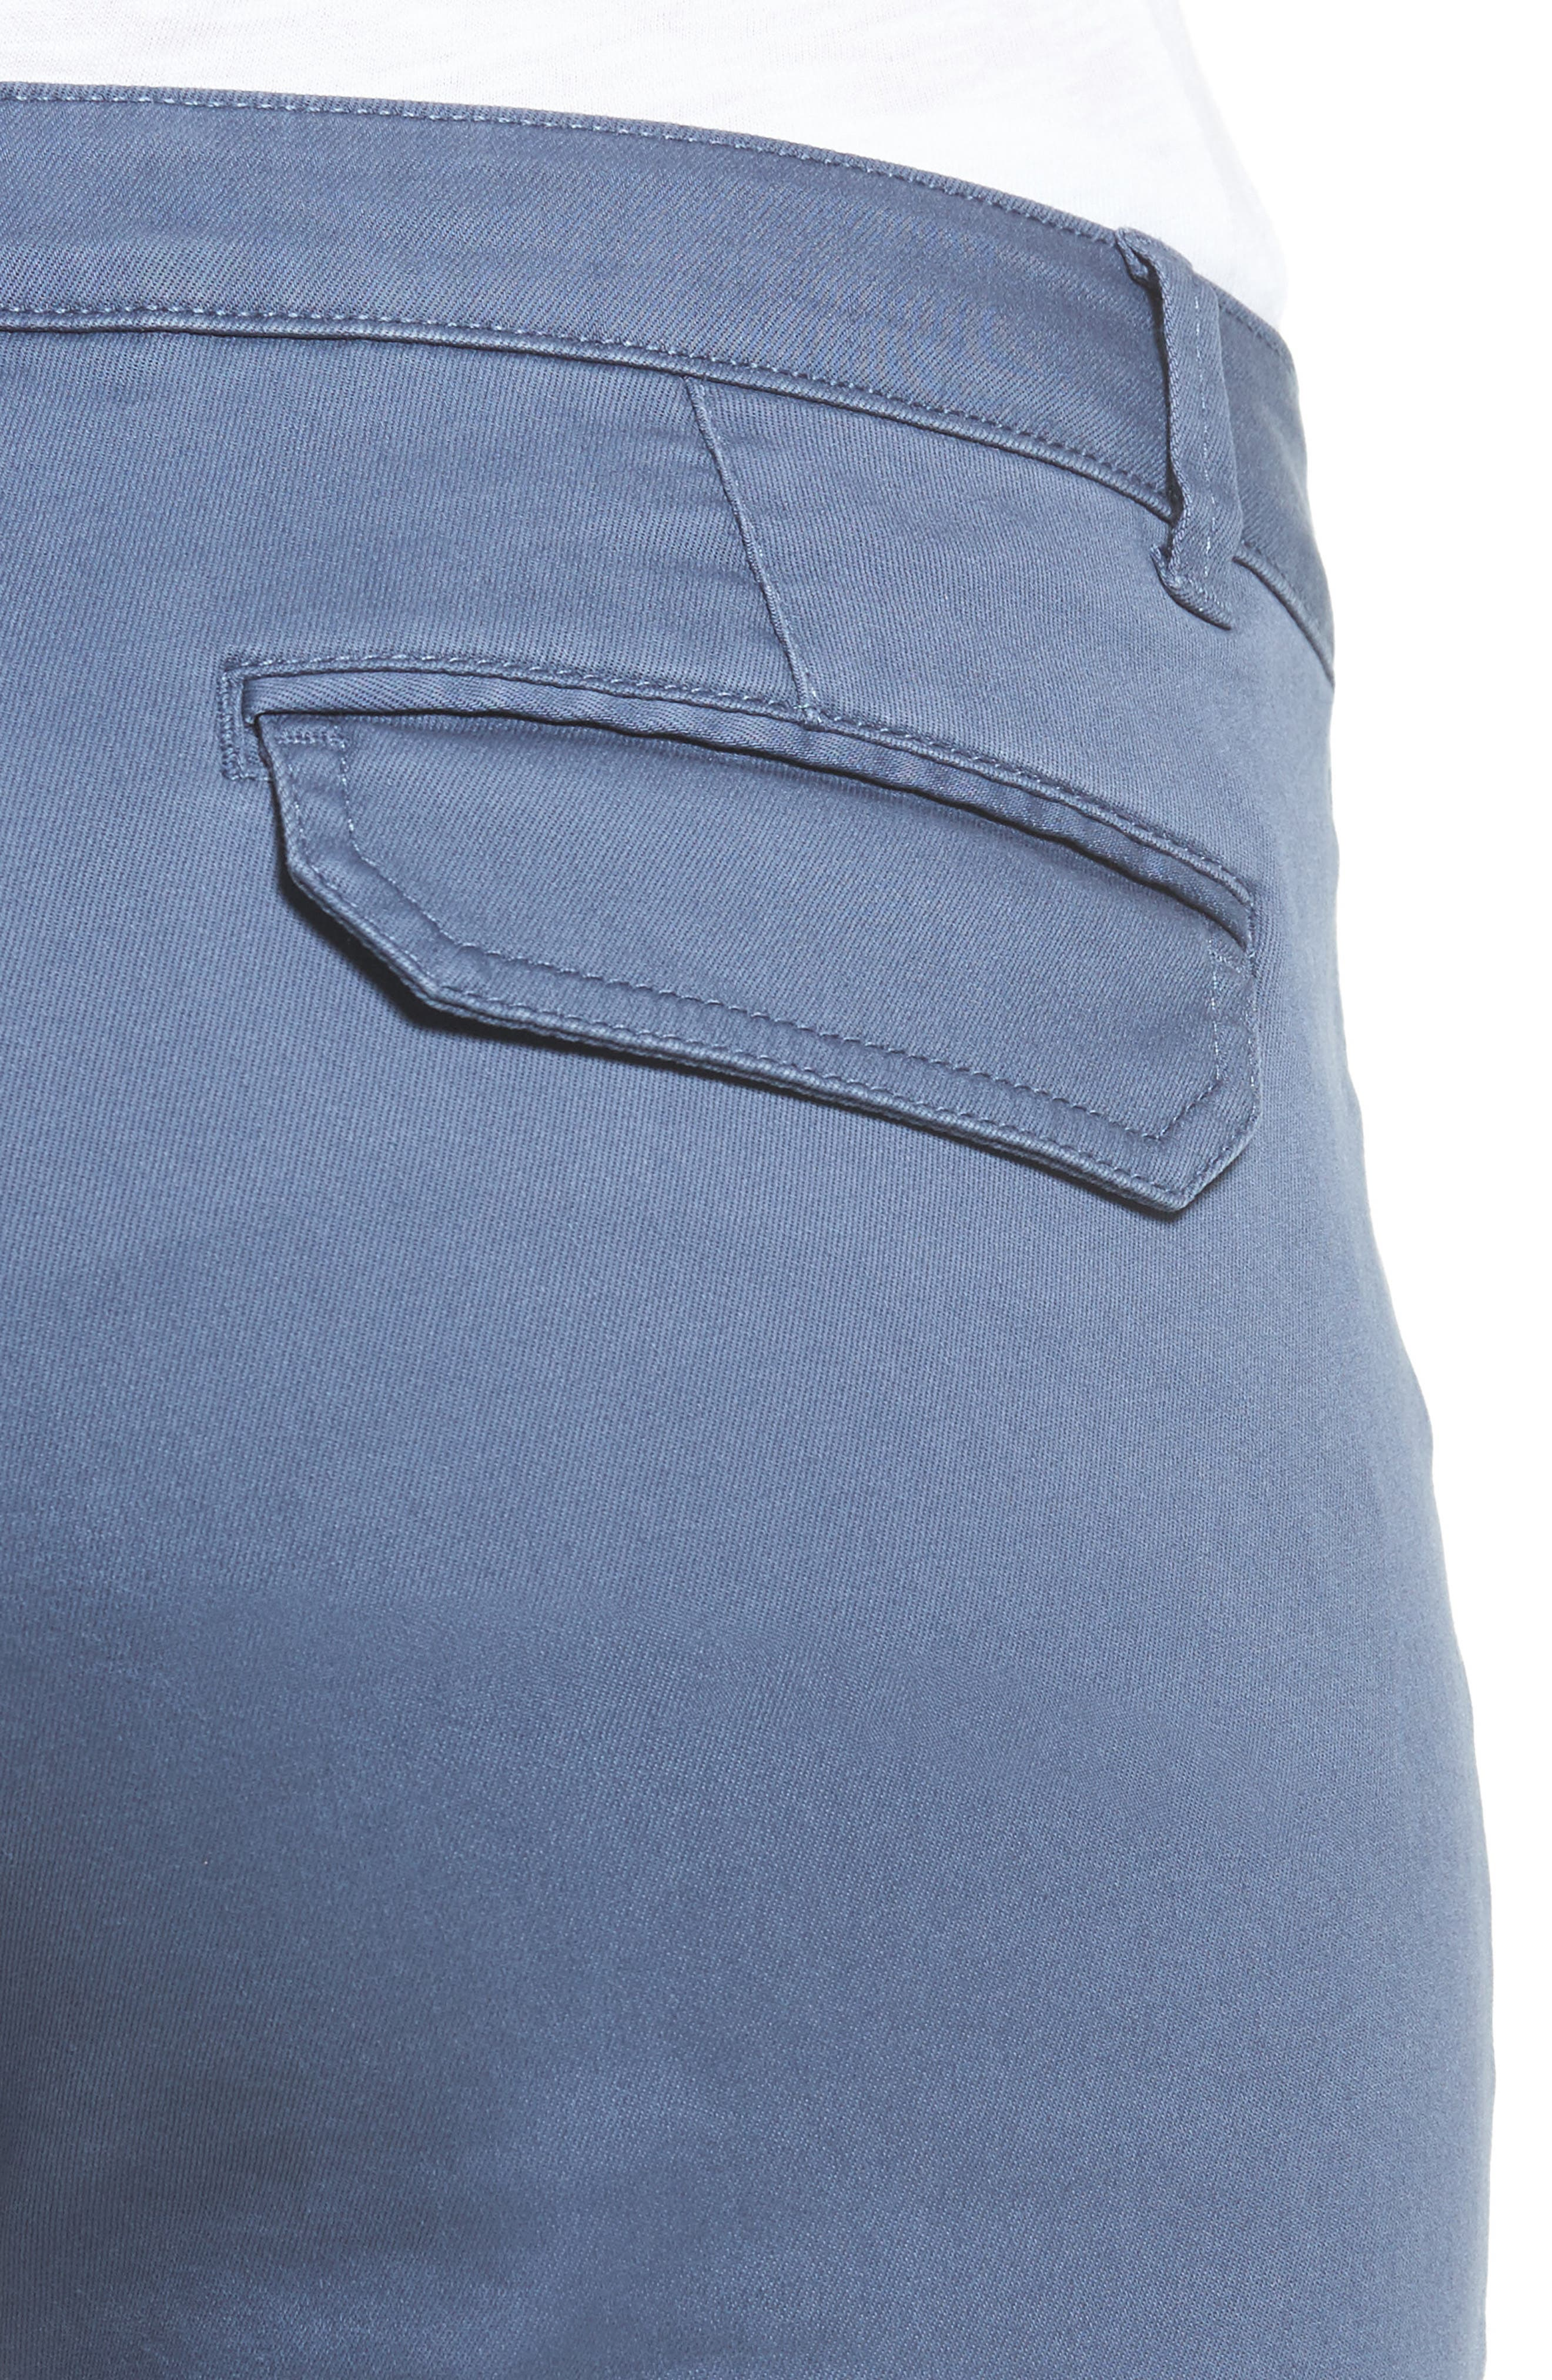 Skinny Cargo Pants,                             Alternate thumbnail 50, color,